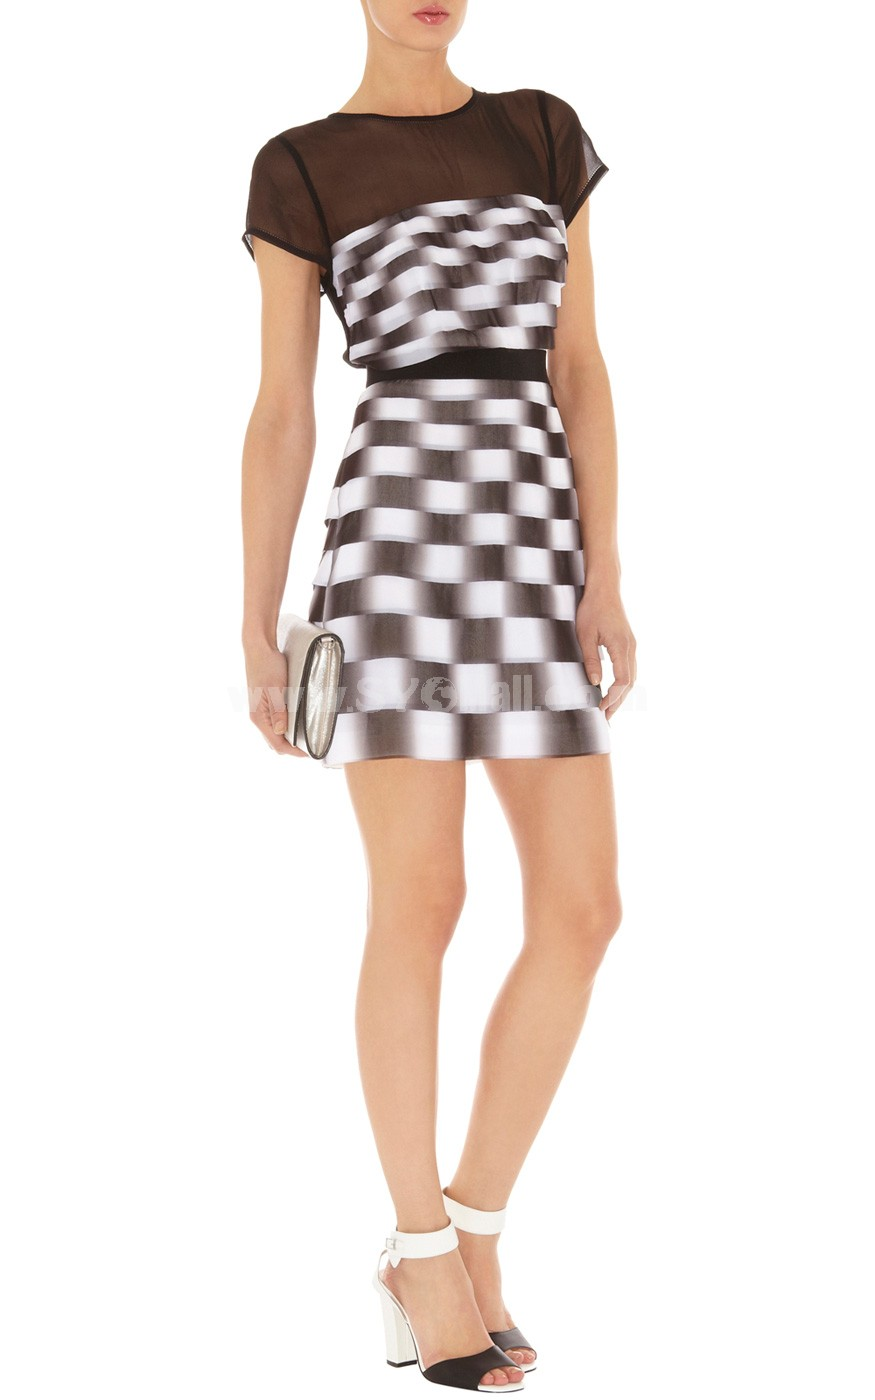 2013 New Arrival Black and White Checks Short Sleeve Slim Dress Evening Dress DQ095